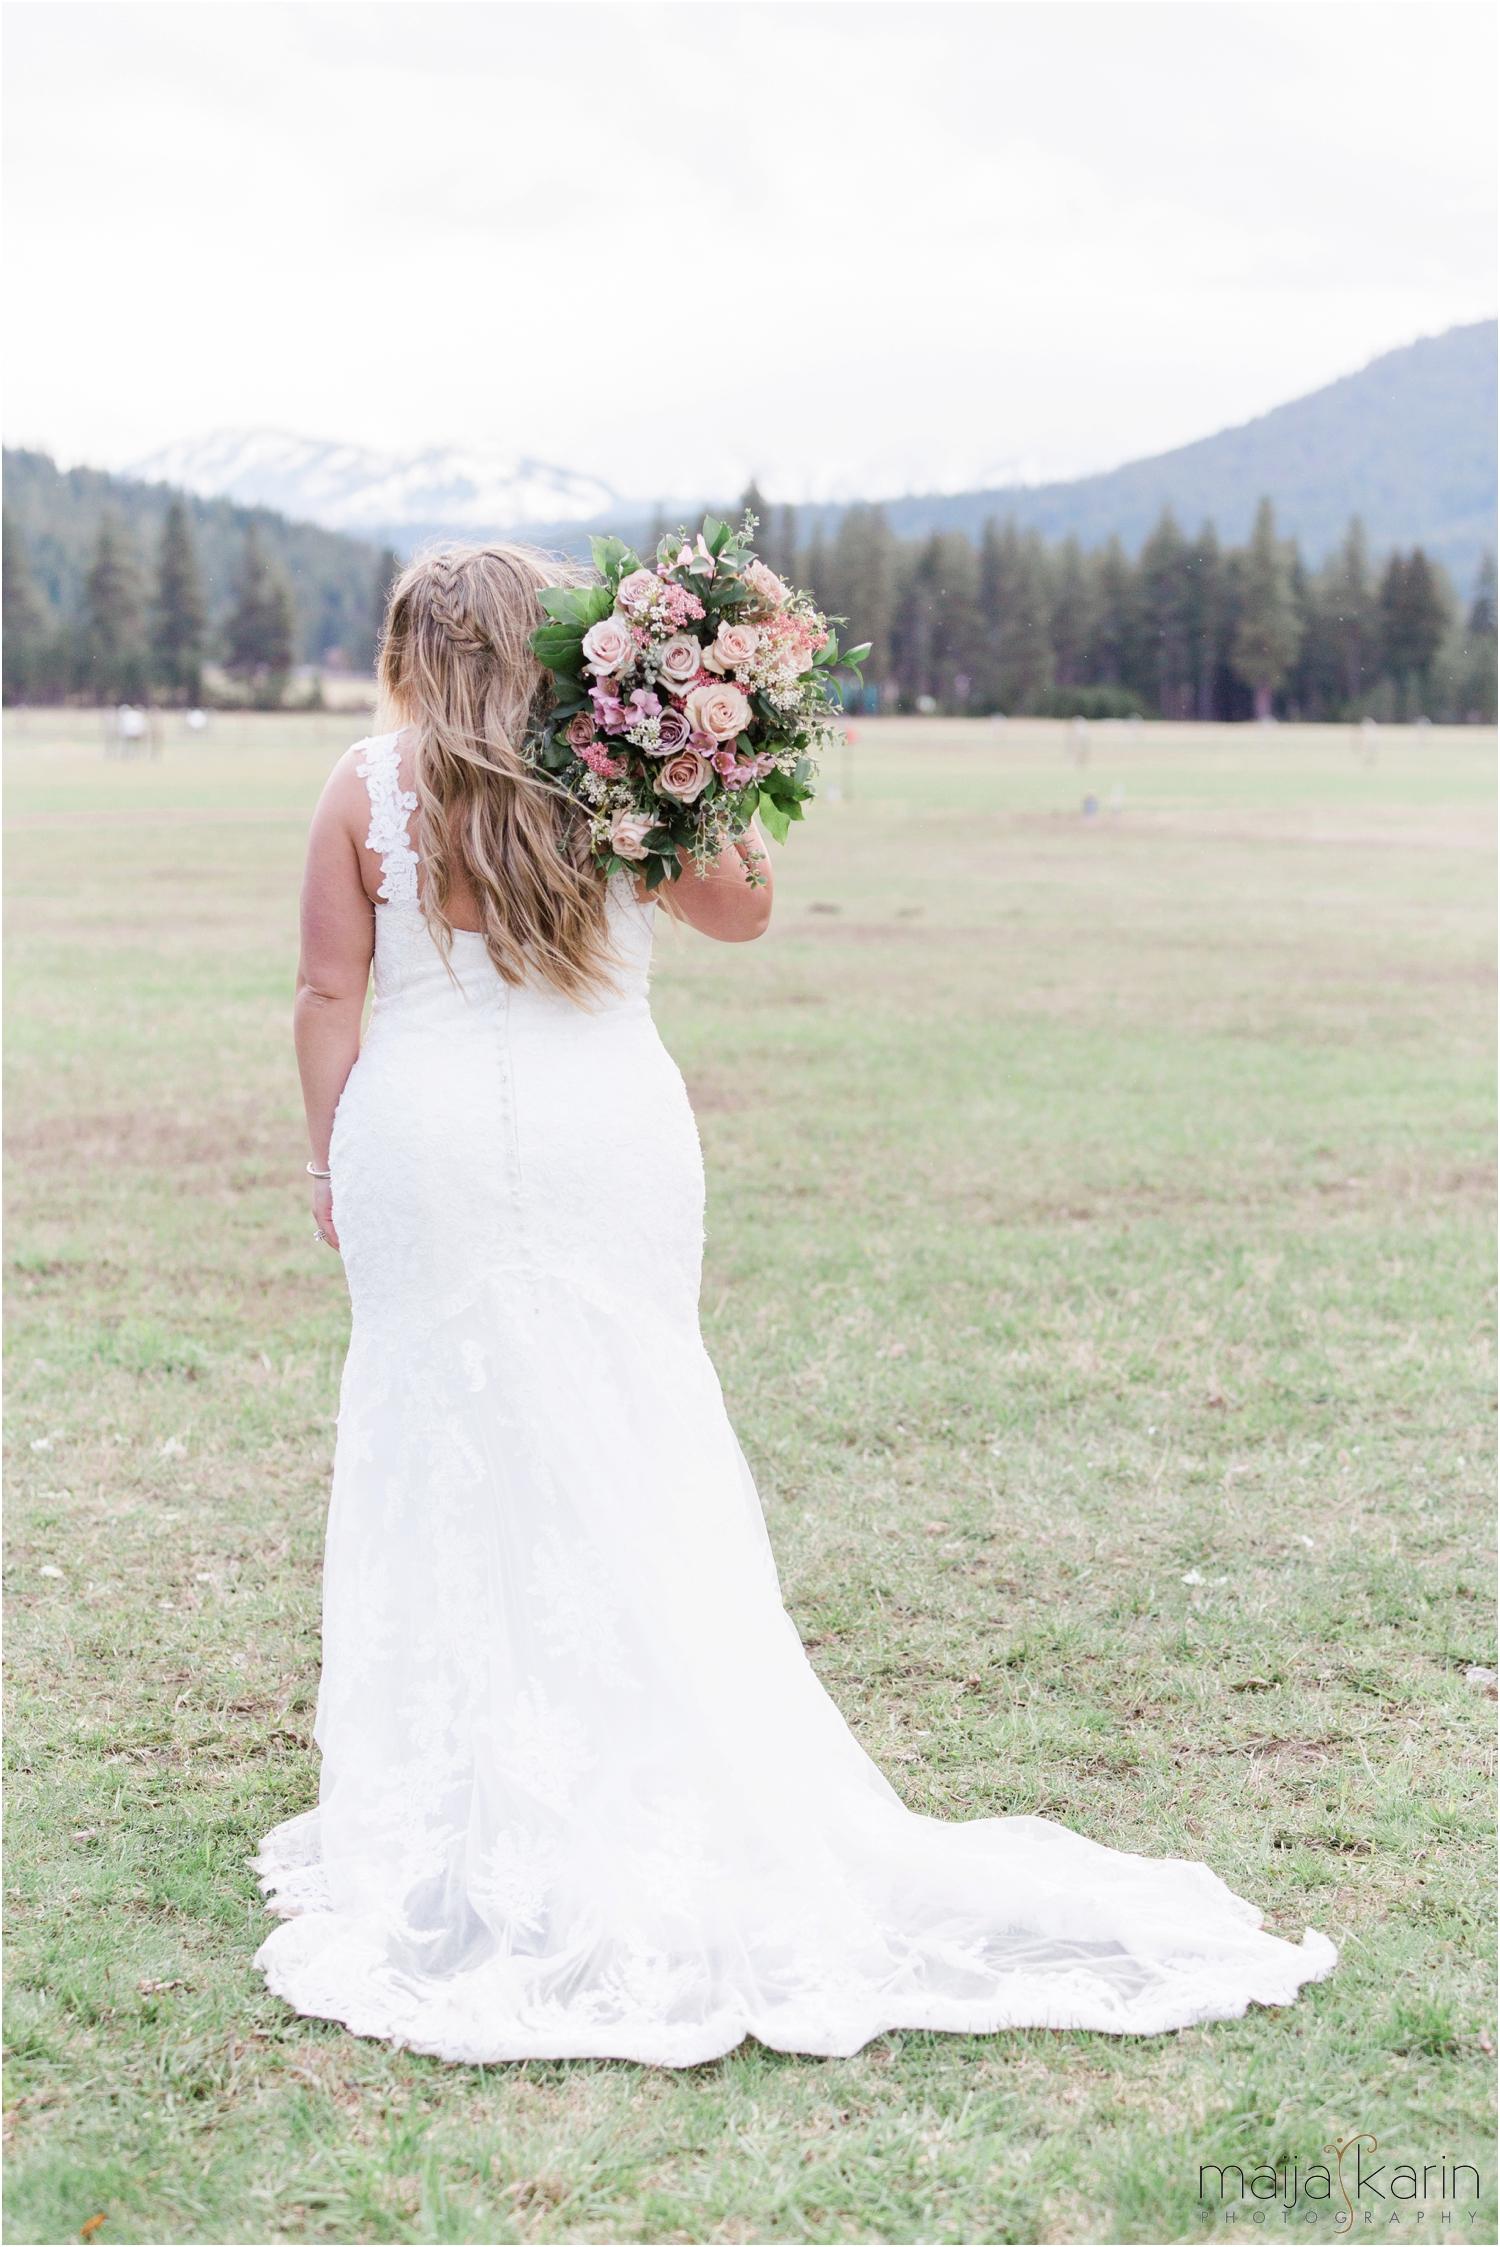 Mountain Springs Lodge wedding Maija Karin Photography%0DMaija Karin Photography%0DMaija Karin Photography%0DMountain-Springs-Lodge-Wedding-Maija-Karin-Photography_0066.jpg